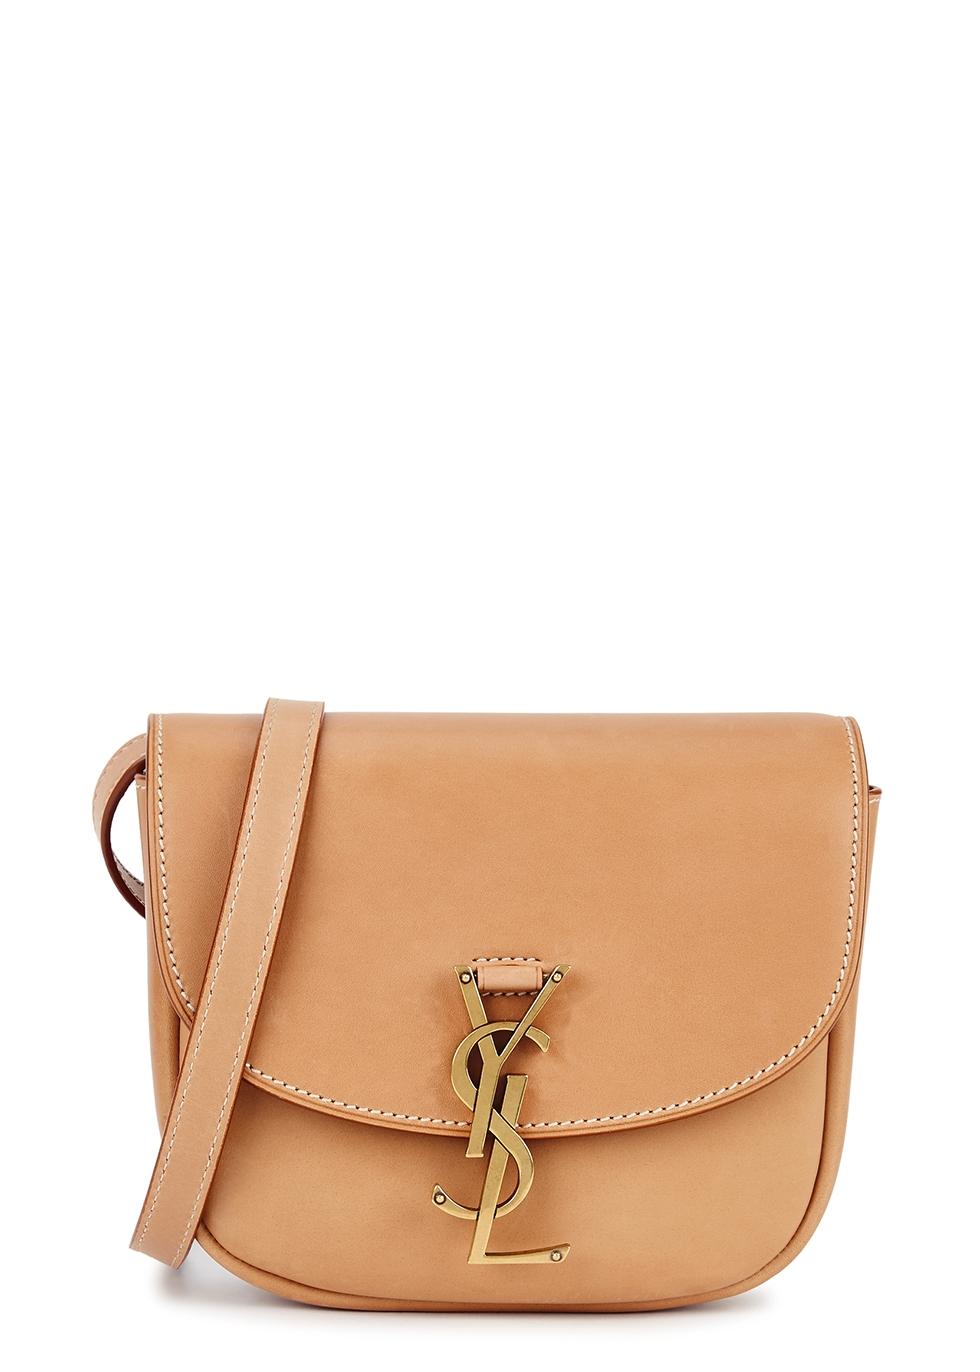 Kaia light brown leather cross-body bag